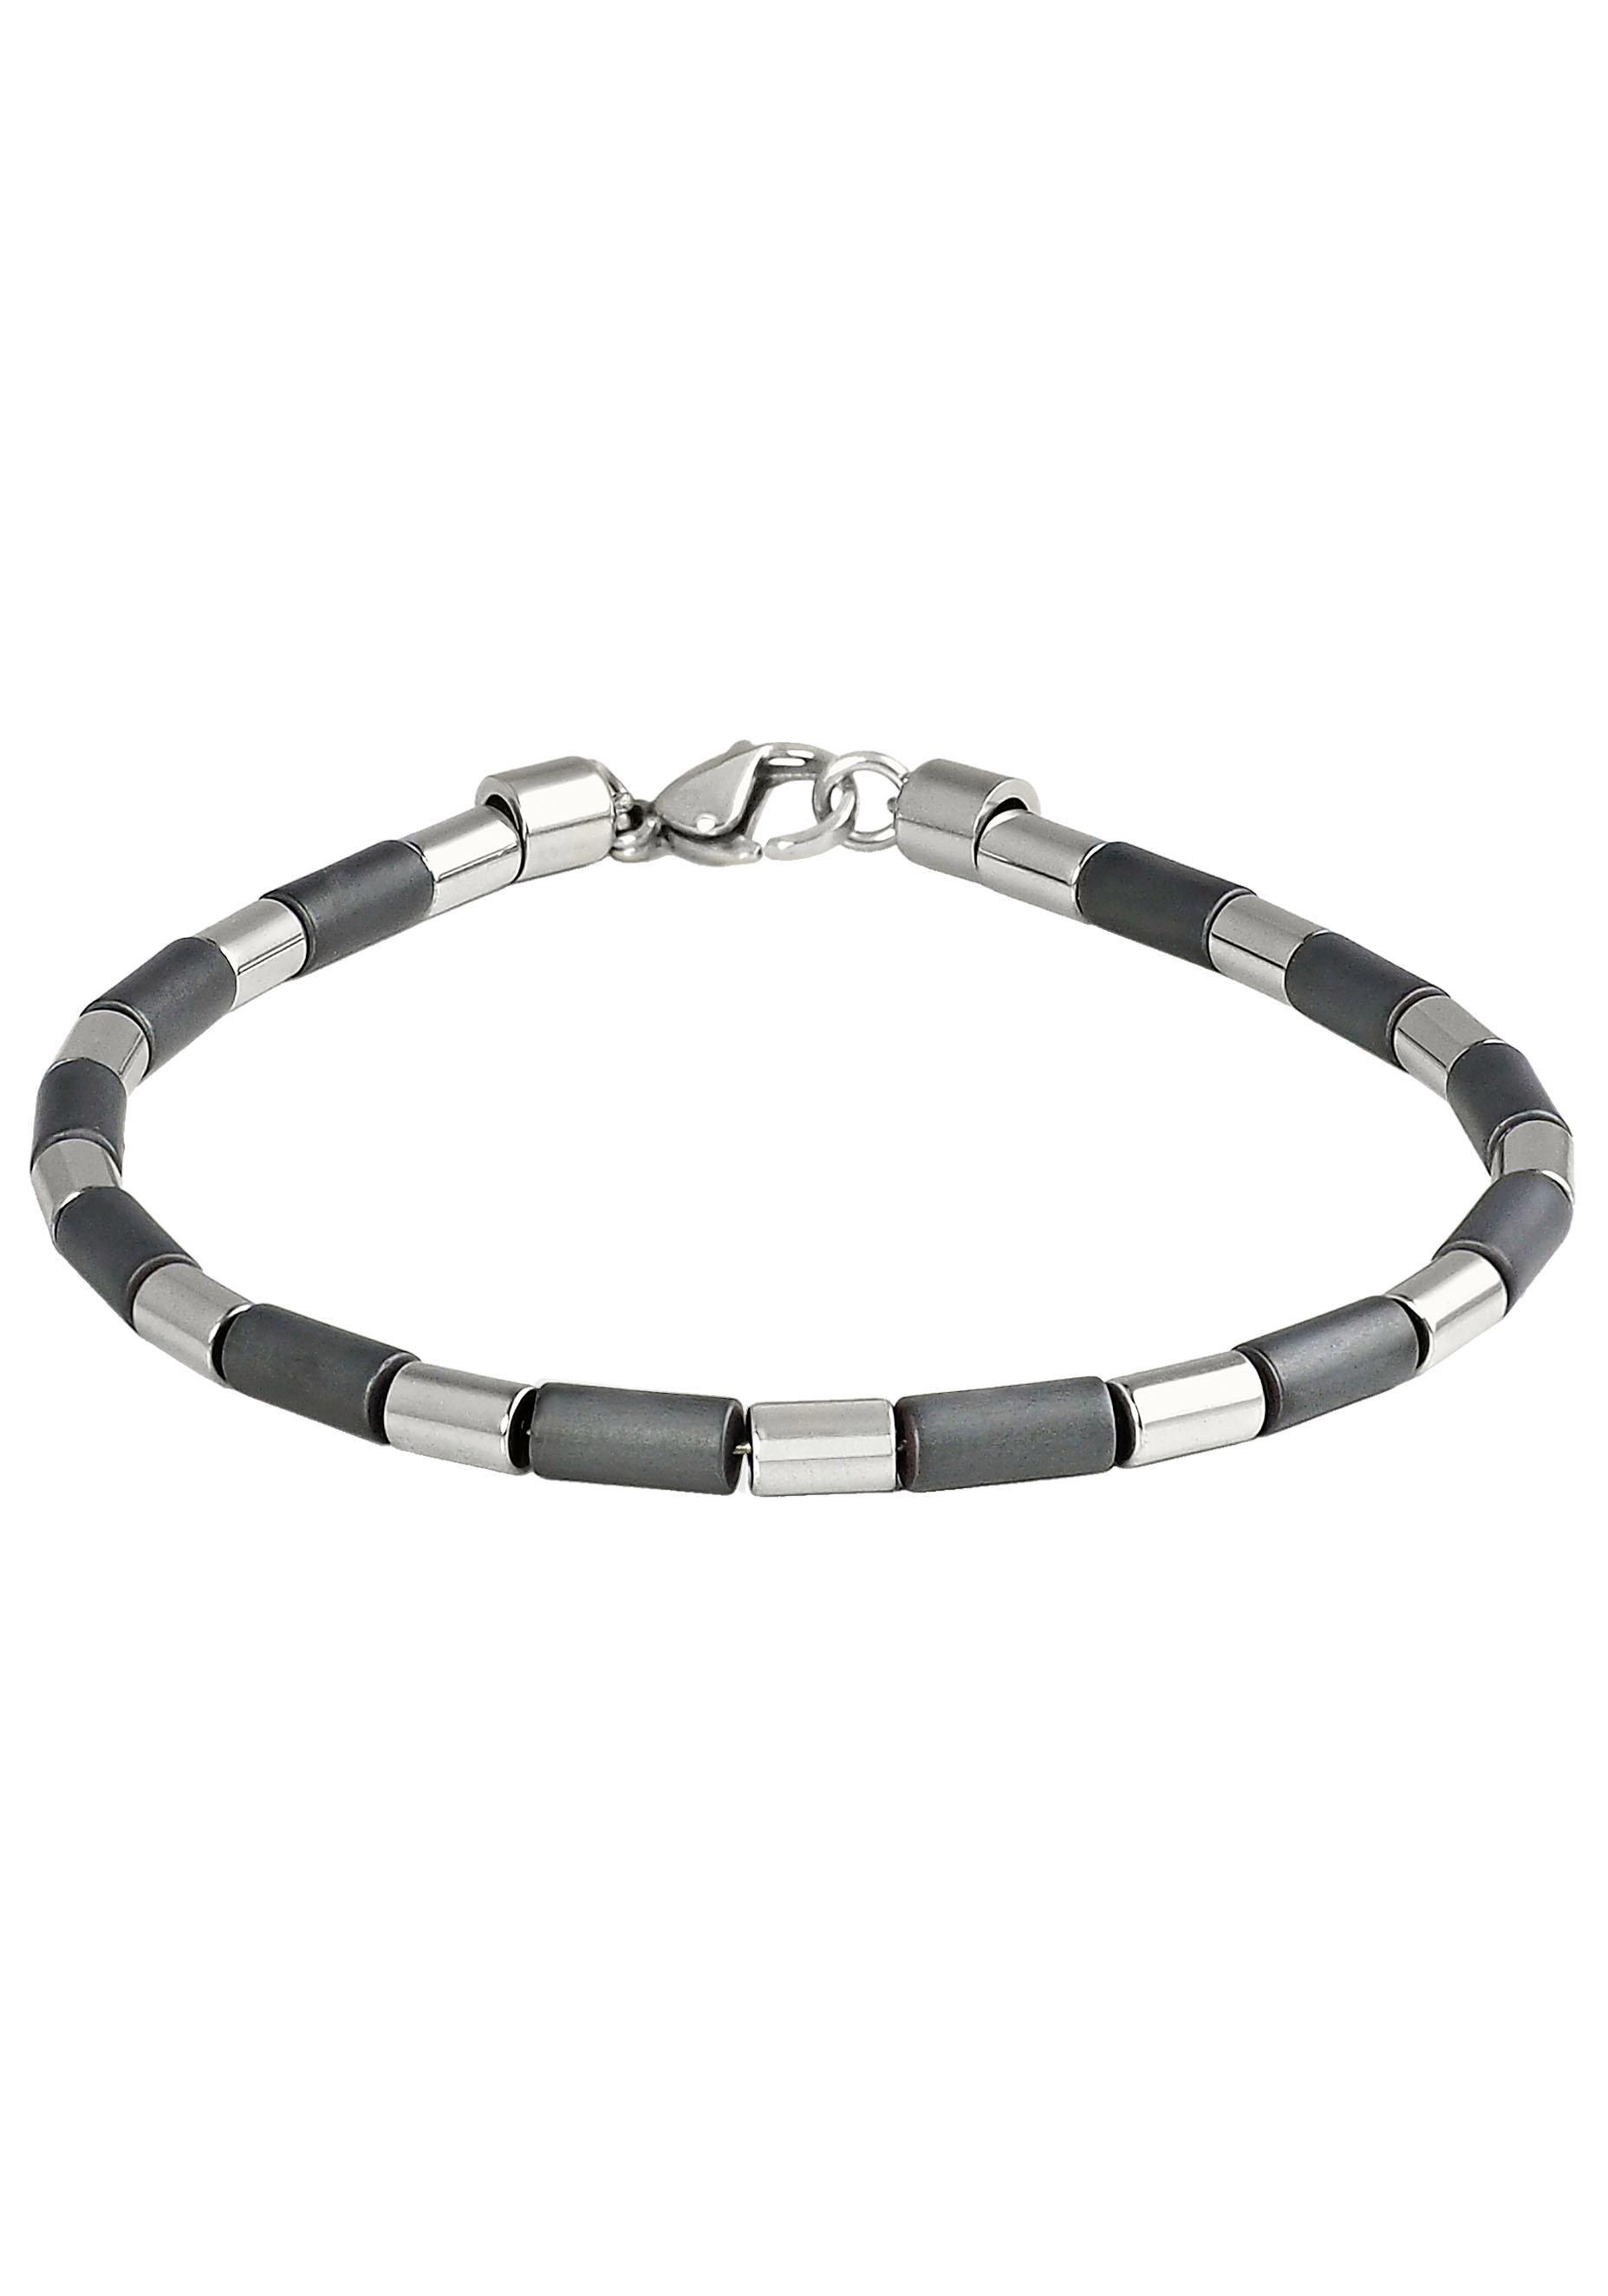 Firetti Armband Edelstahl Draht, Walzen, matt, glänzend, mit Hämatit, Made günstig online kaufen